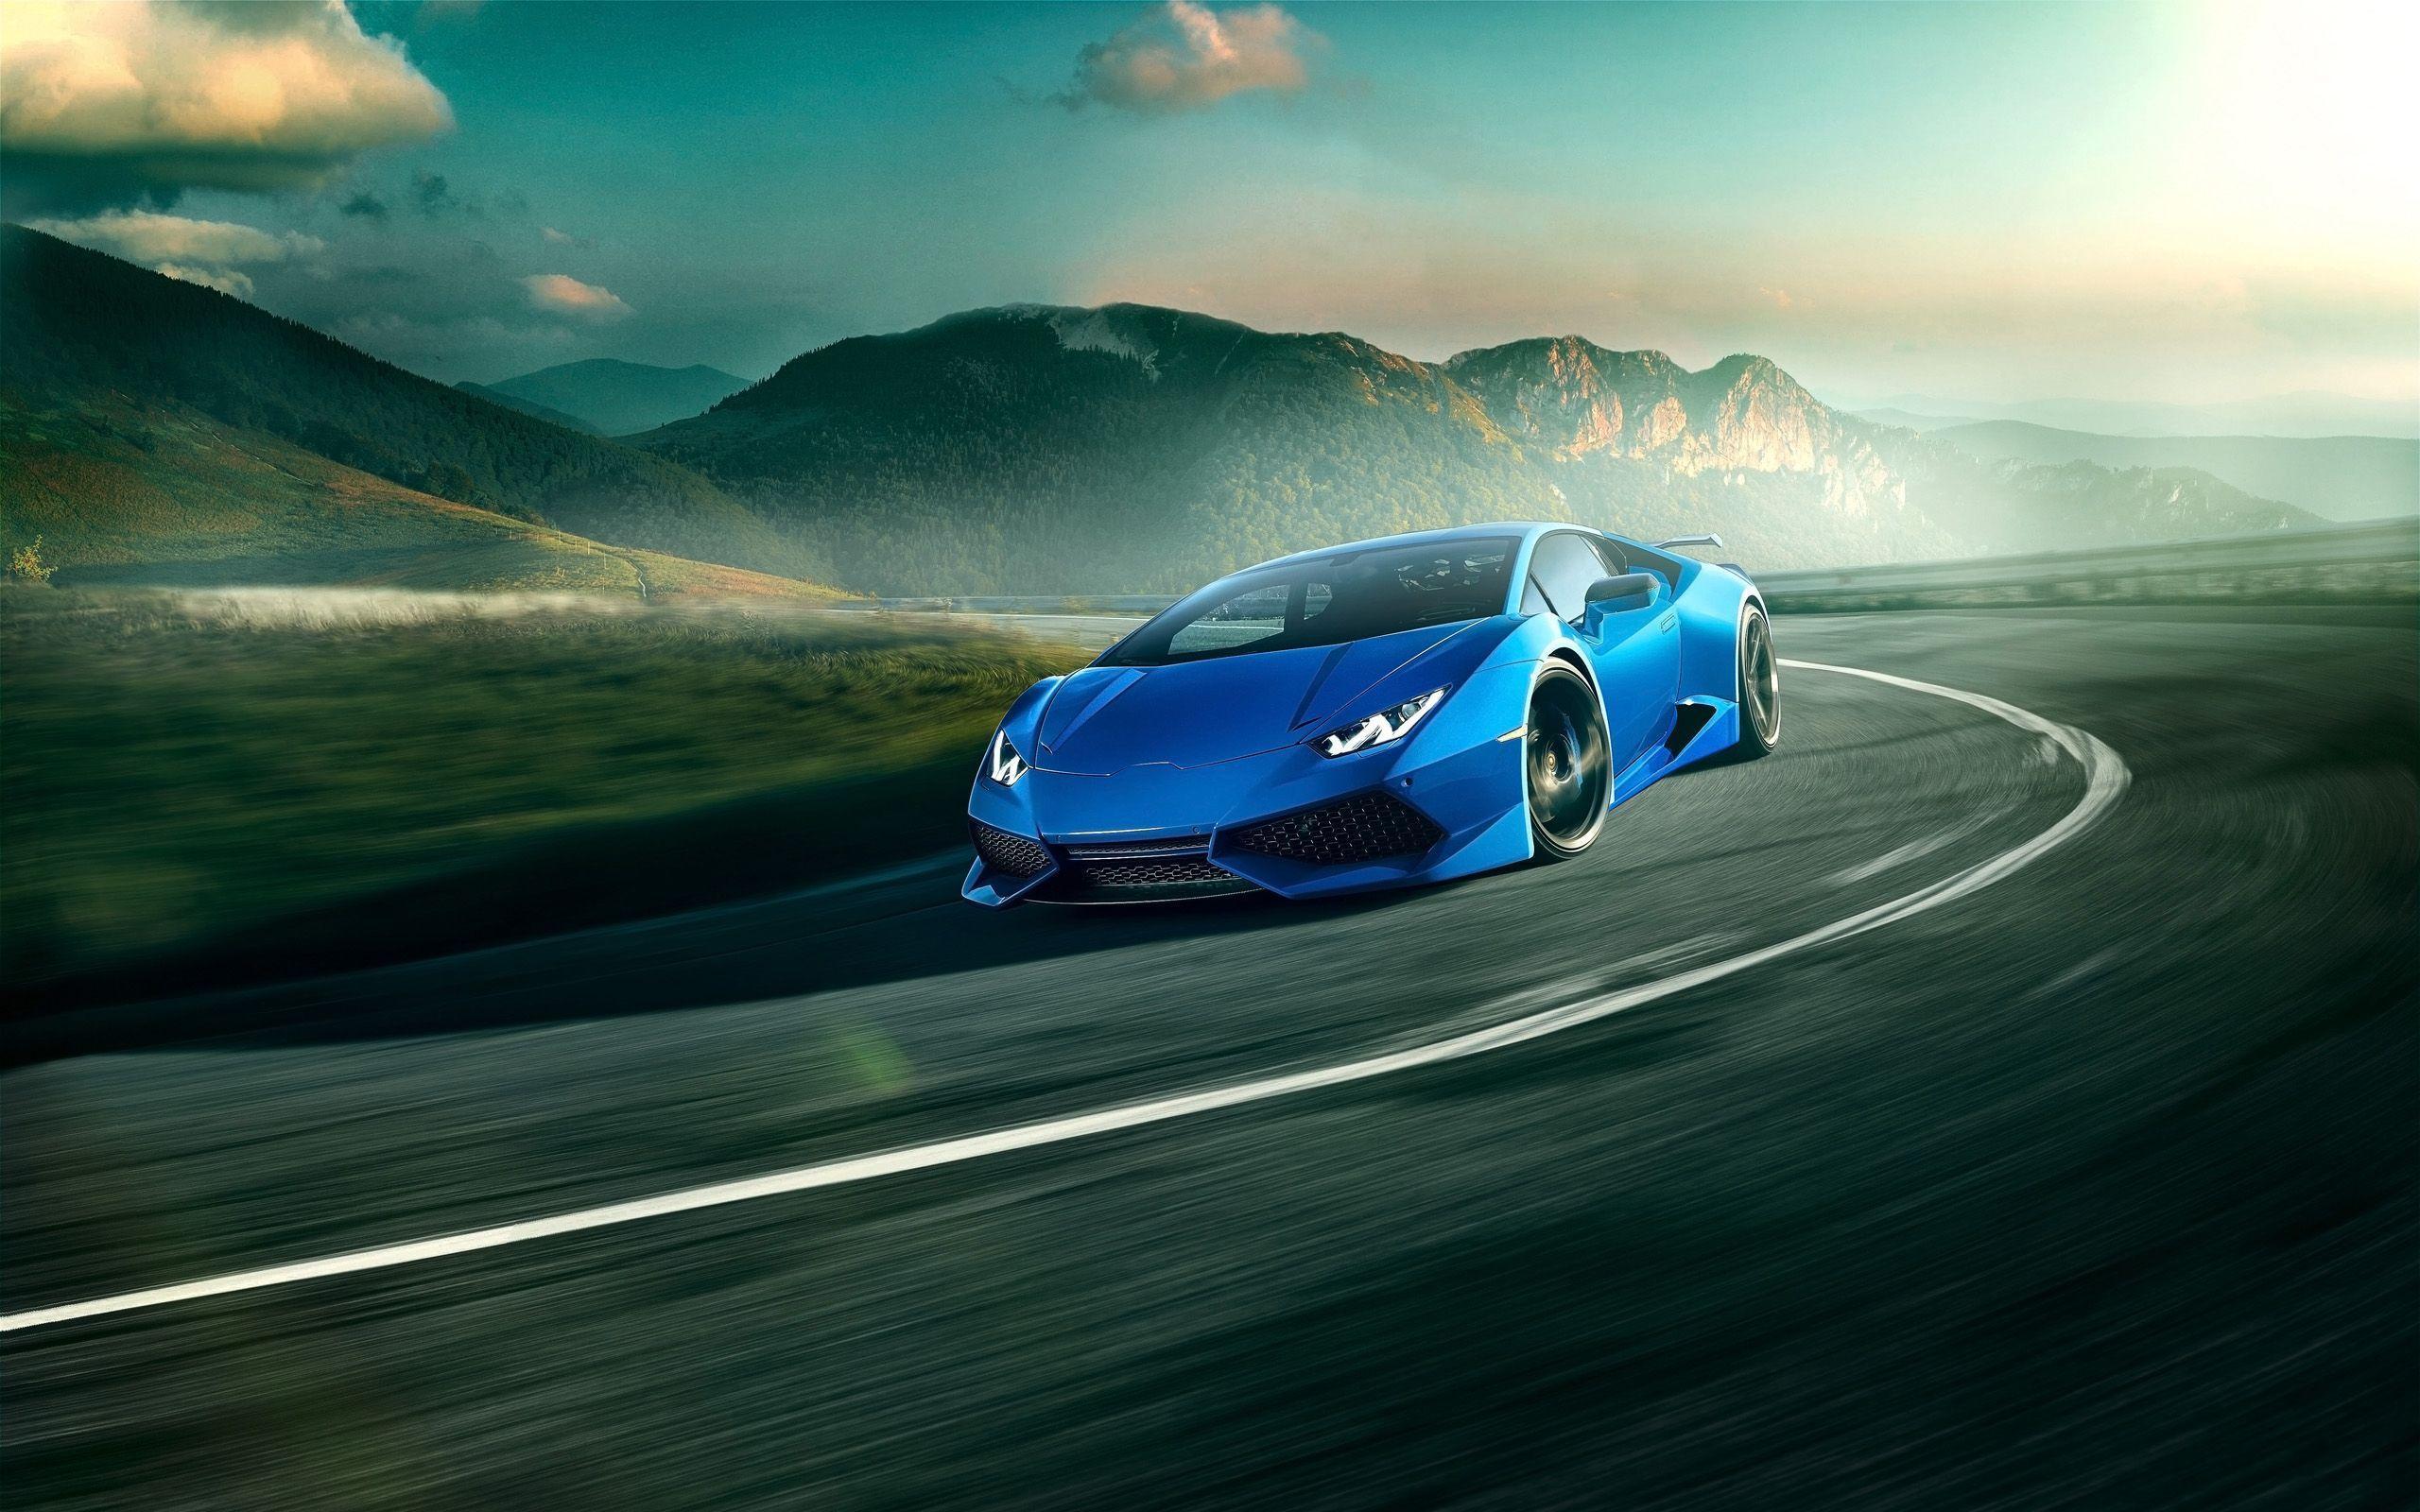 Blue Lamborghini Wallpapers Wallpaper Cave